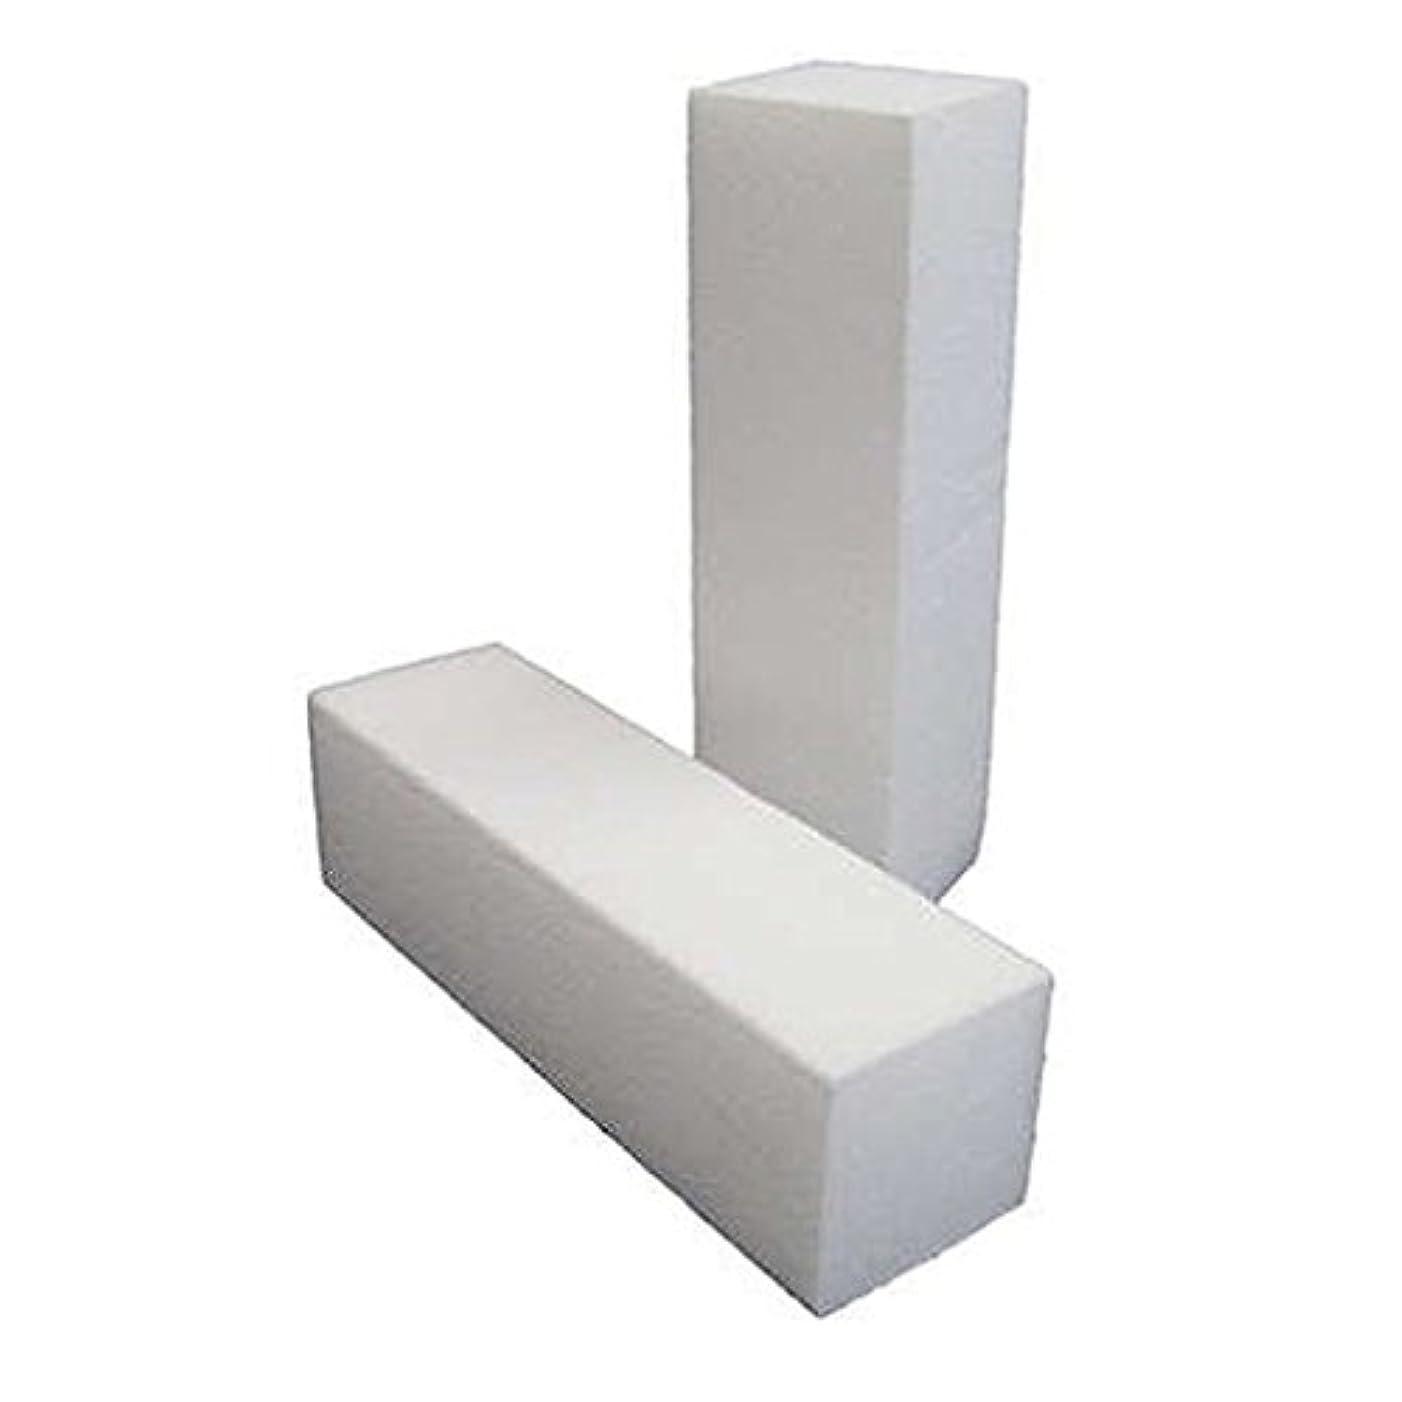 SODIAL(R) バッファーバフサンディングブロックシャイナーファイルアクリルネイルアートホワイト